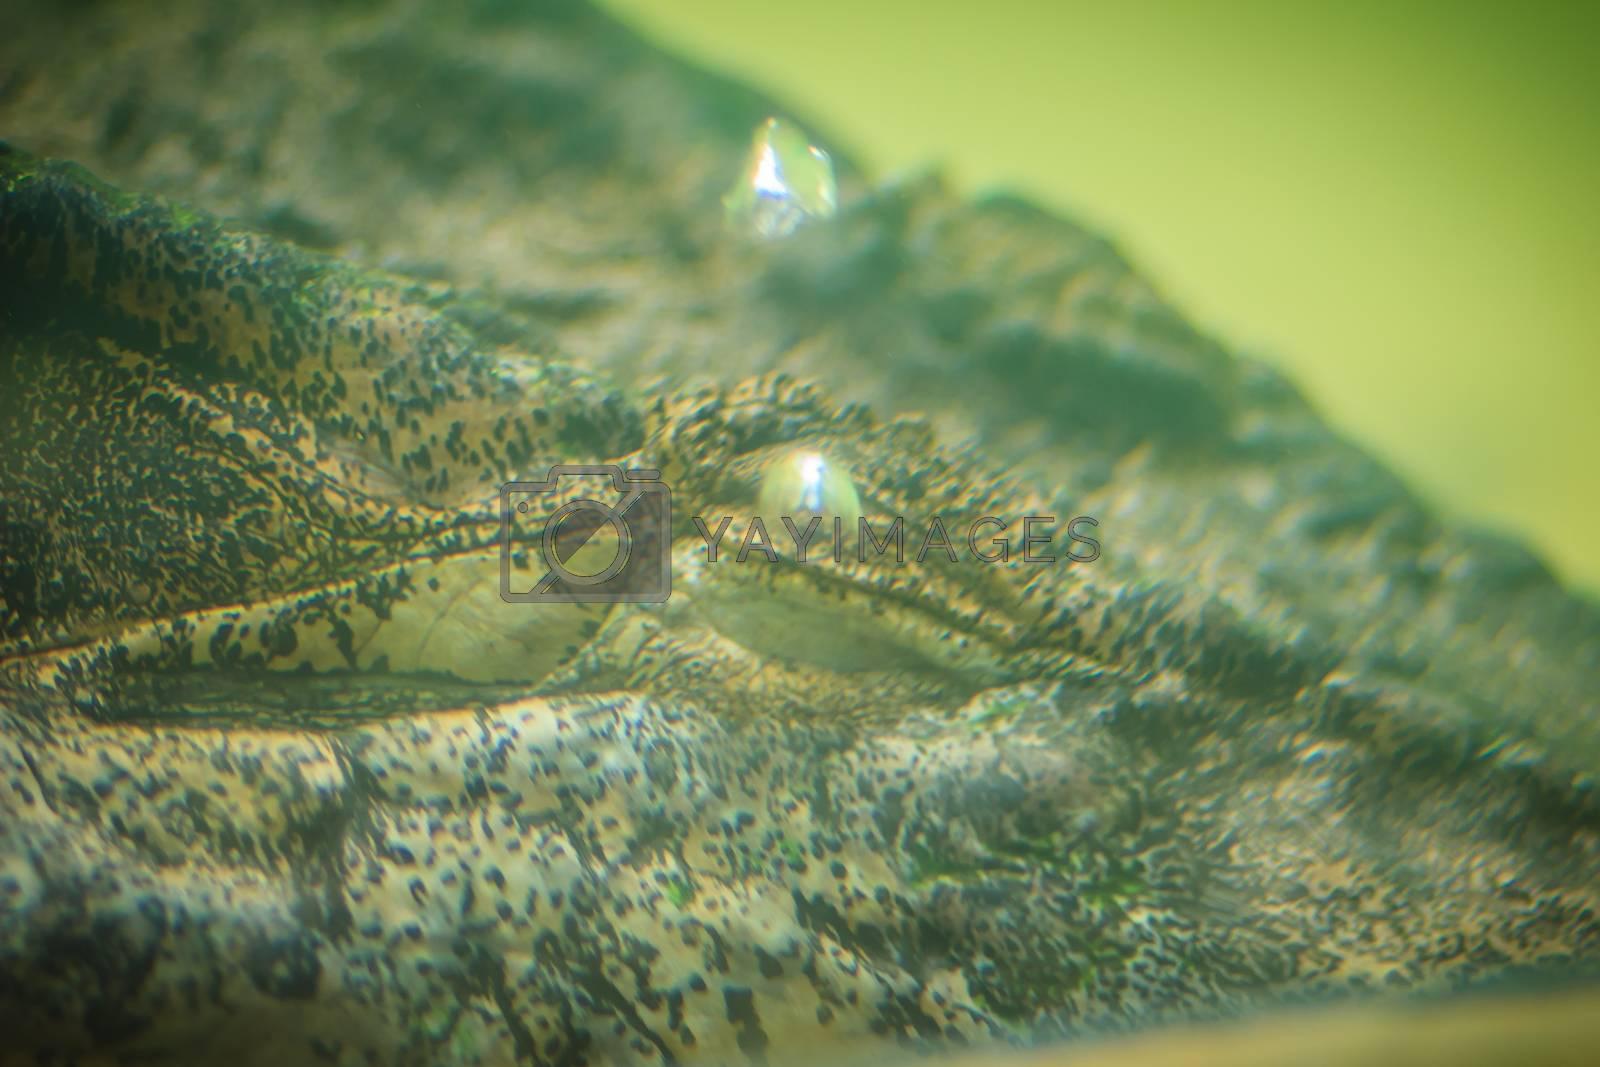 Skin of Saltwater or Estuarine Crocodile (crocodylus porosus) hide under water